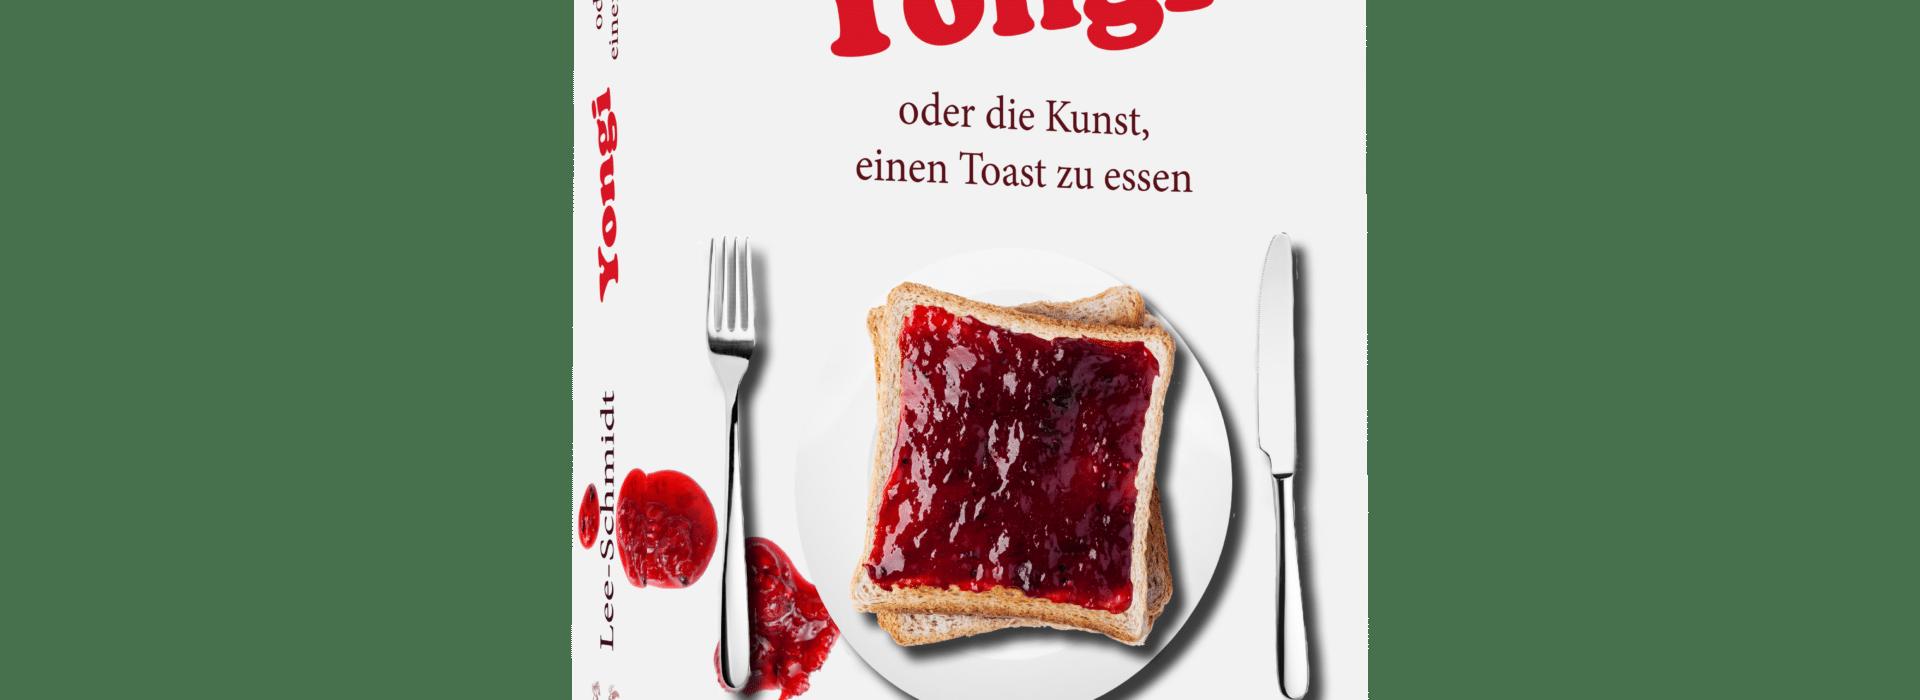 Deutsche Literarturgesellschaft, Lee-Schmidt